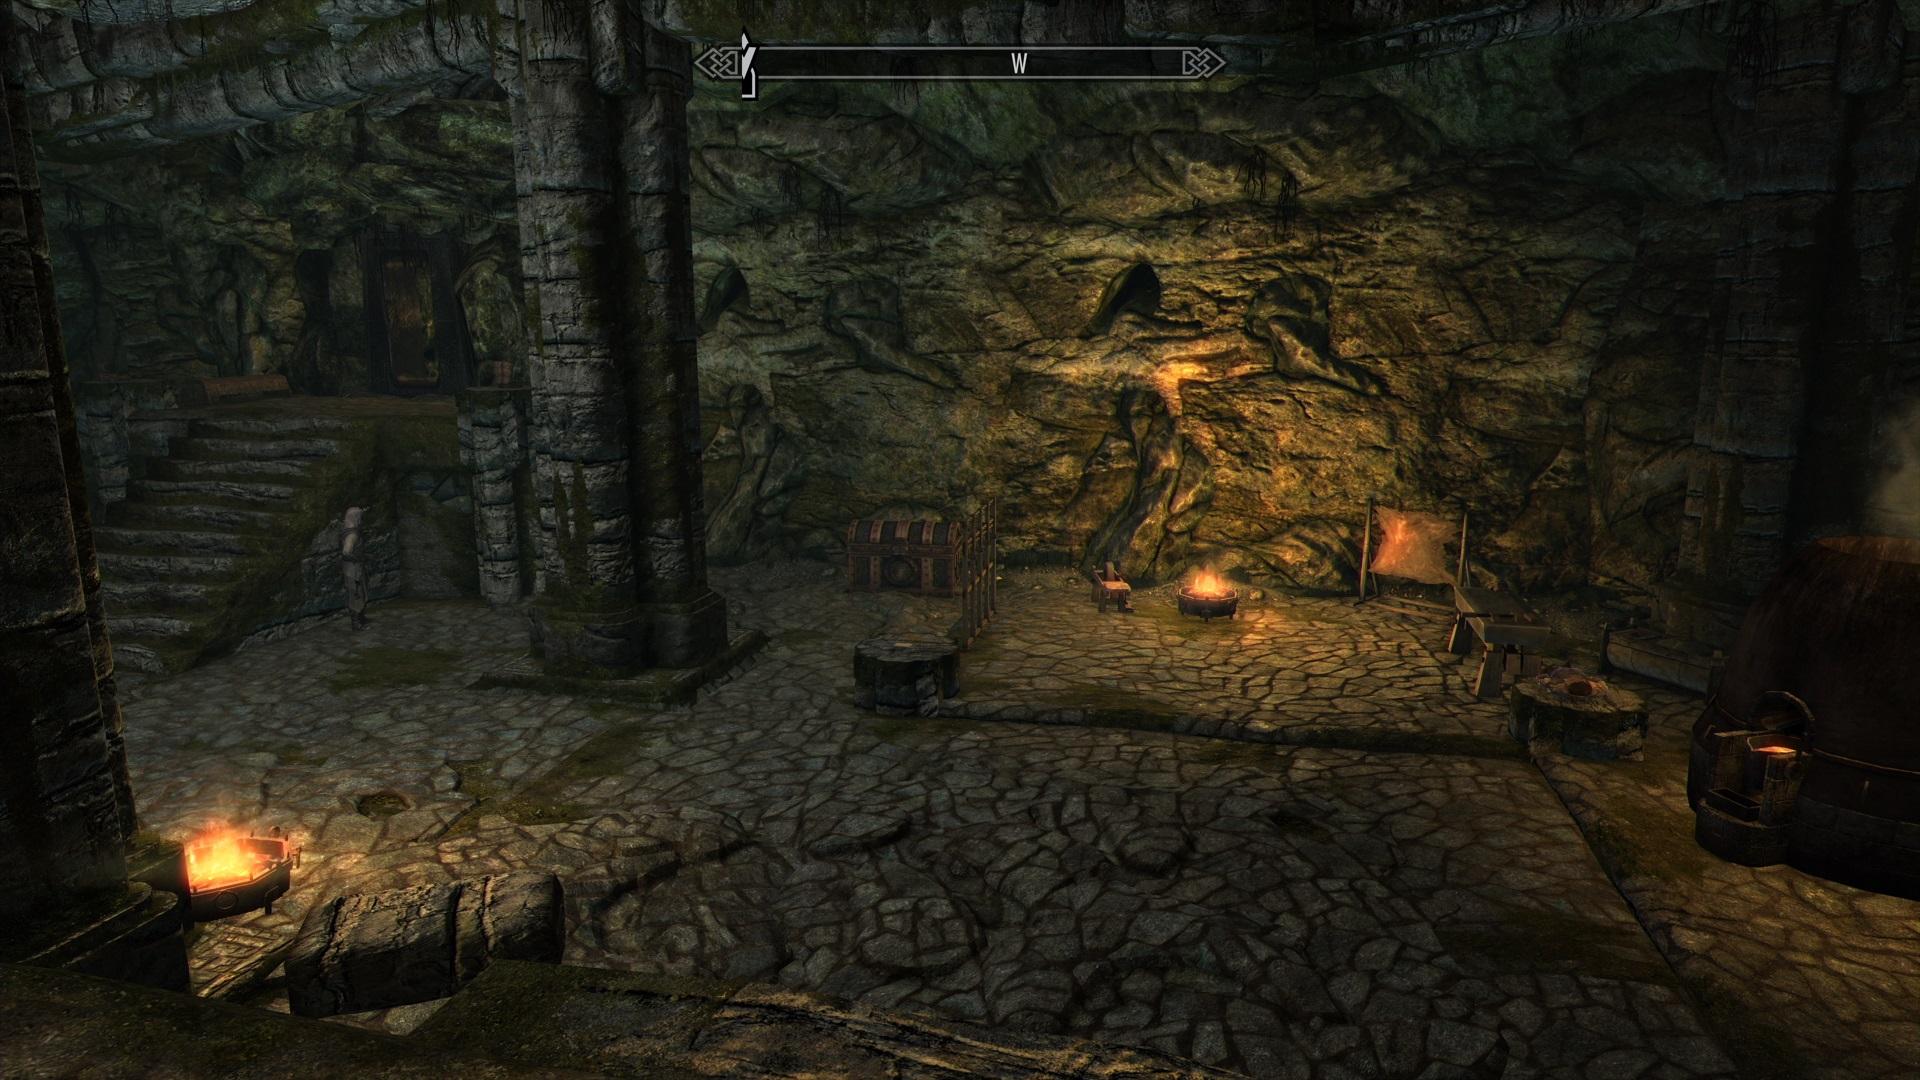 PS4スカイリム]MOD紹介209 - ゲームの玉子様